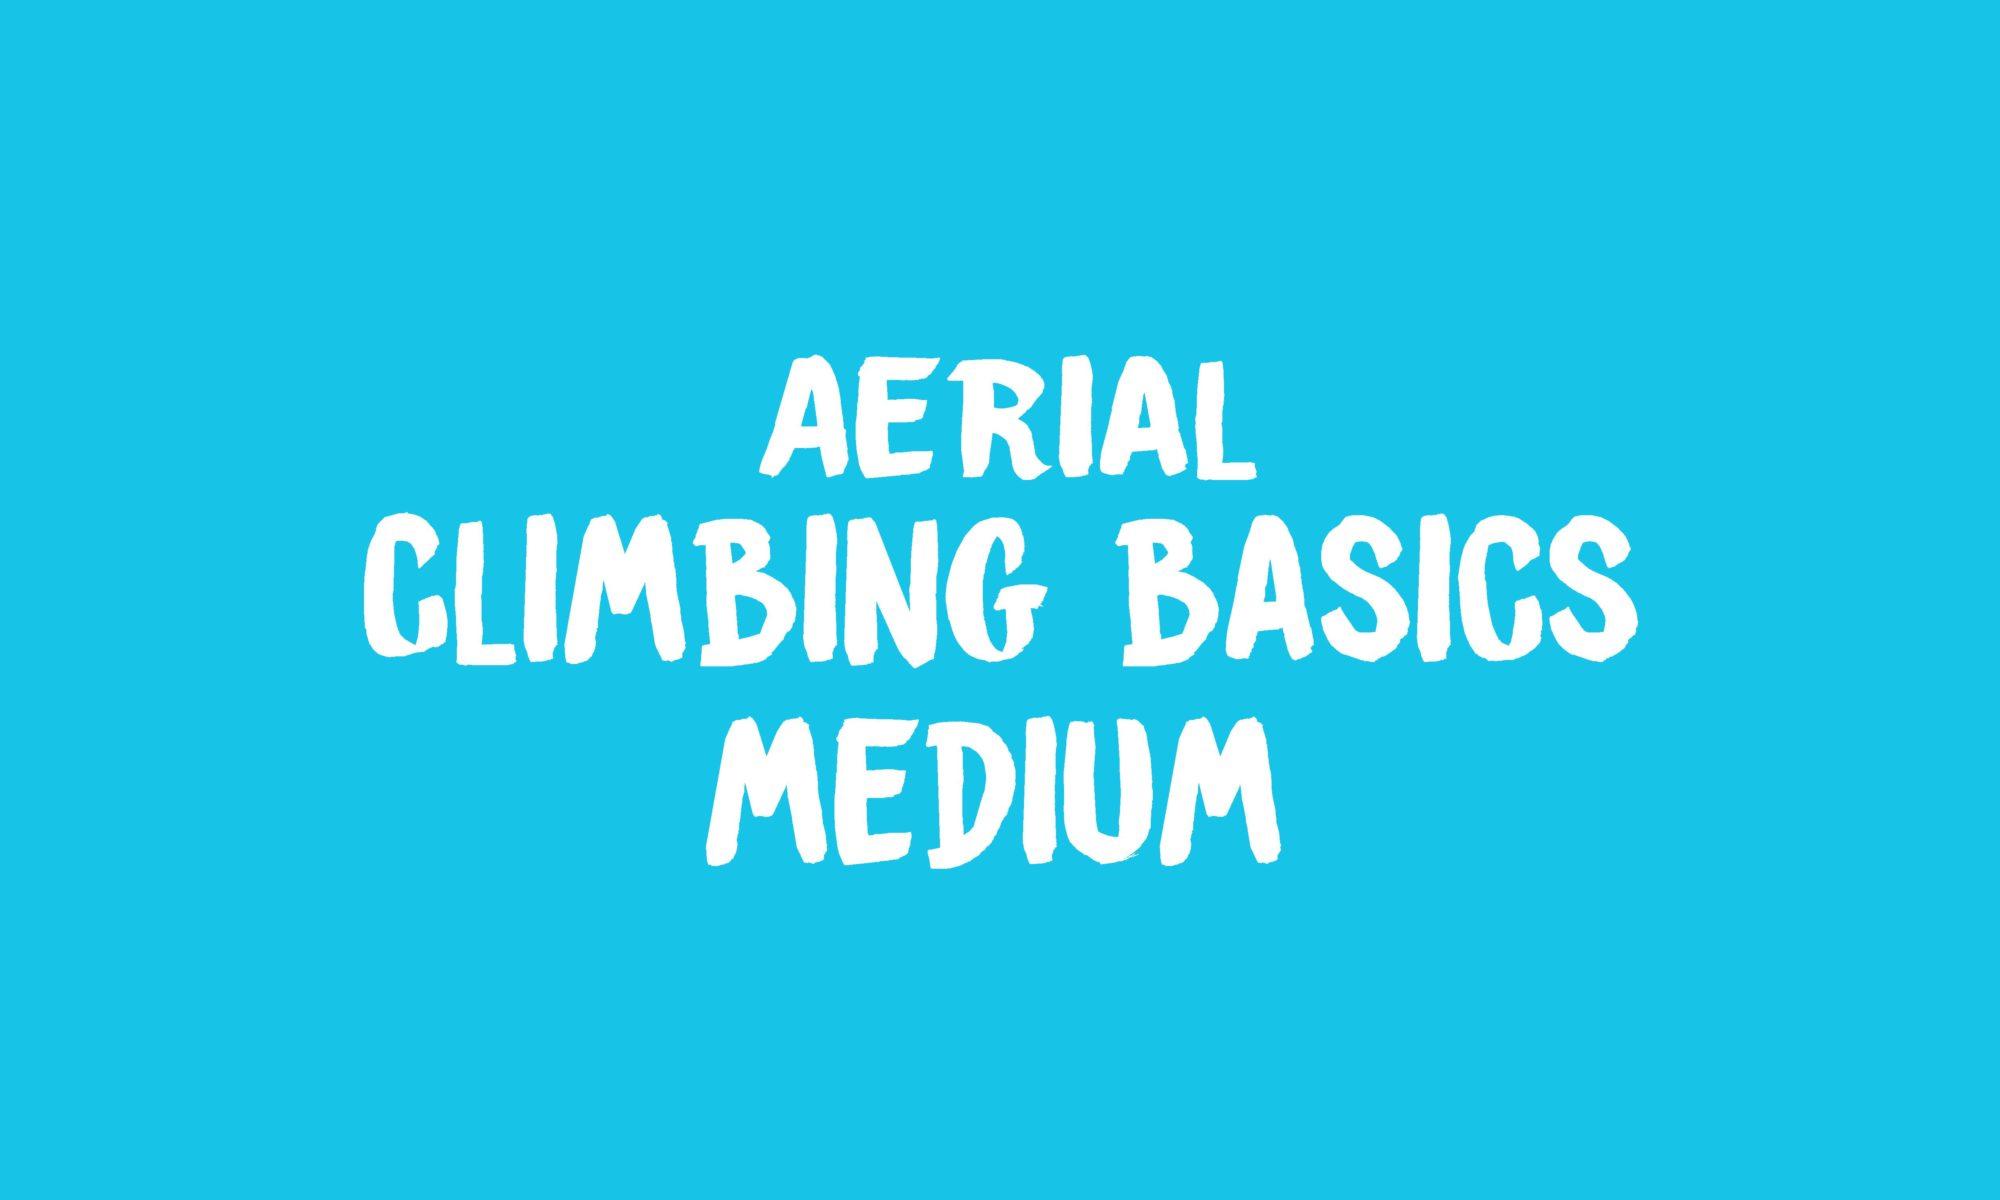 Aerial Climbing Basics banner